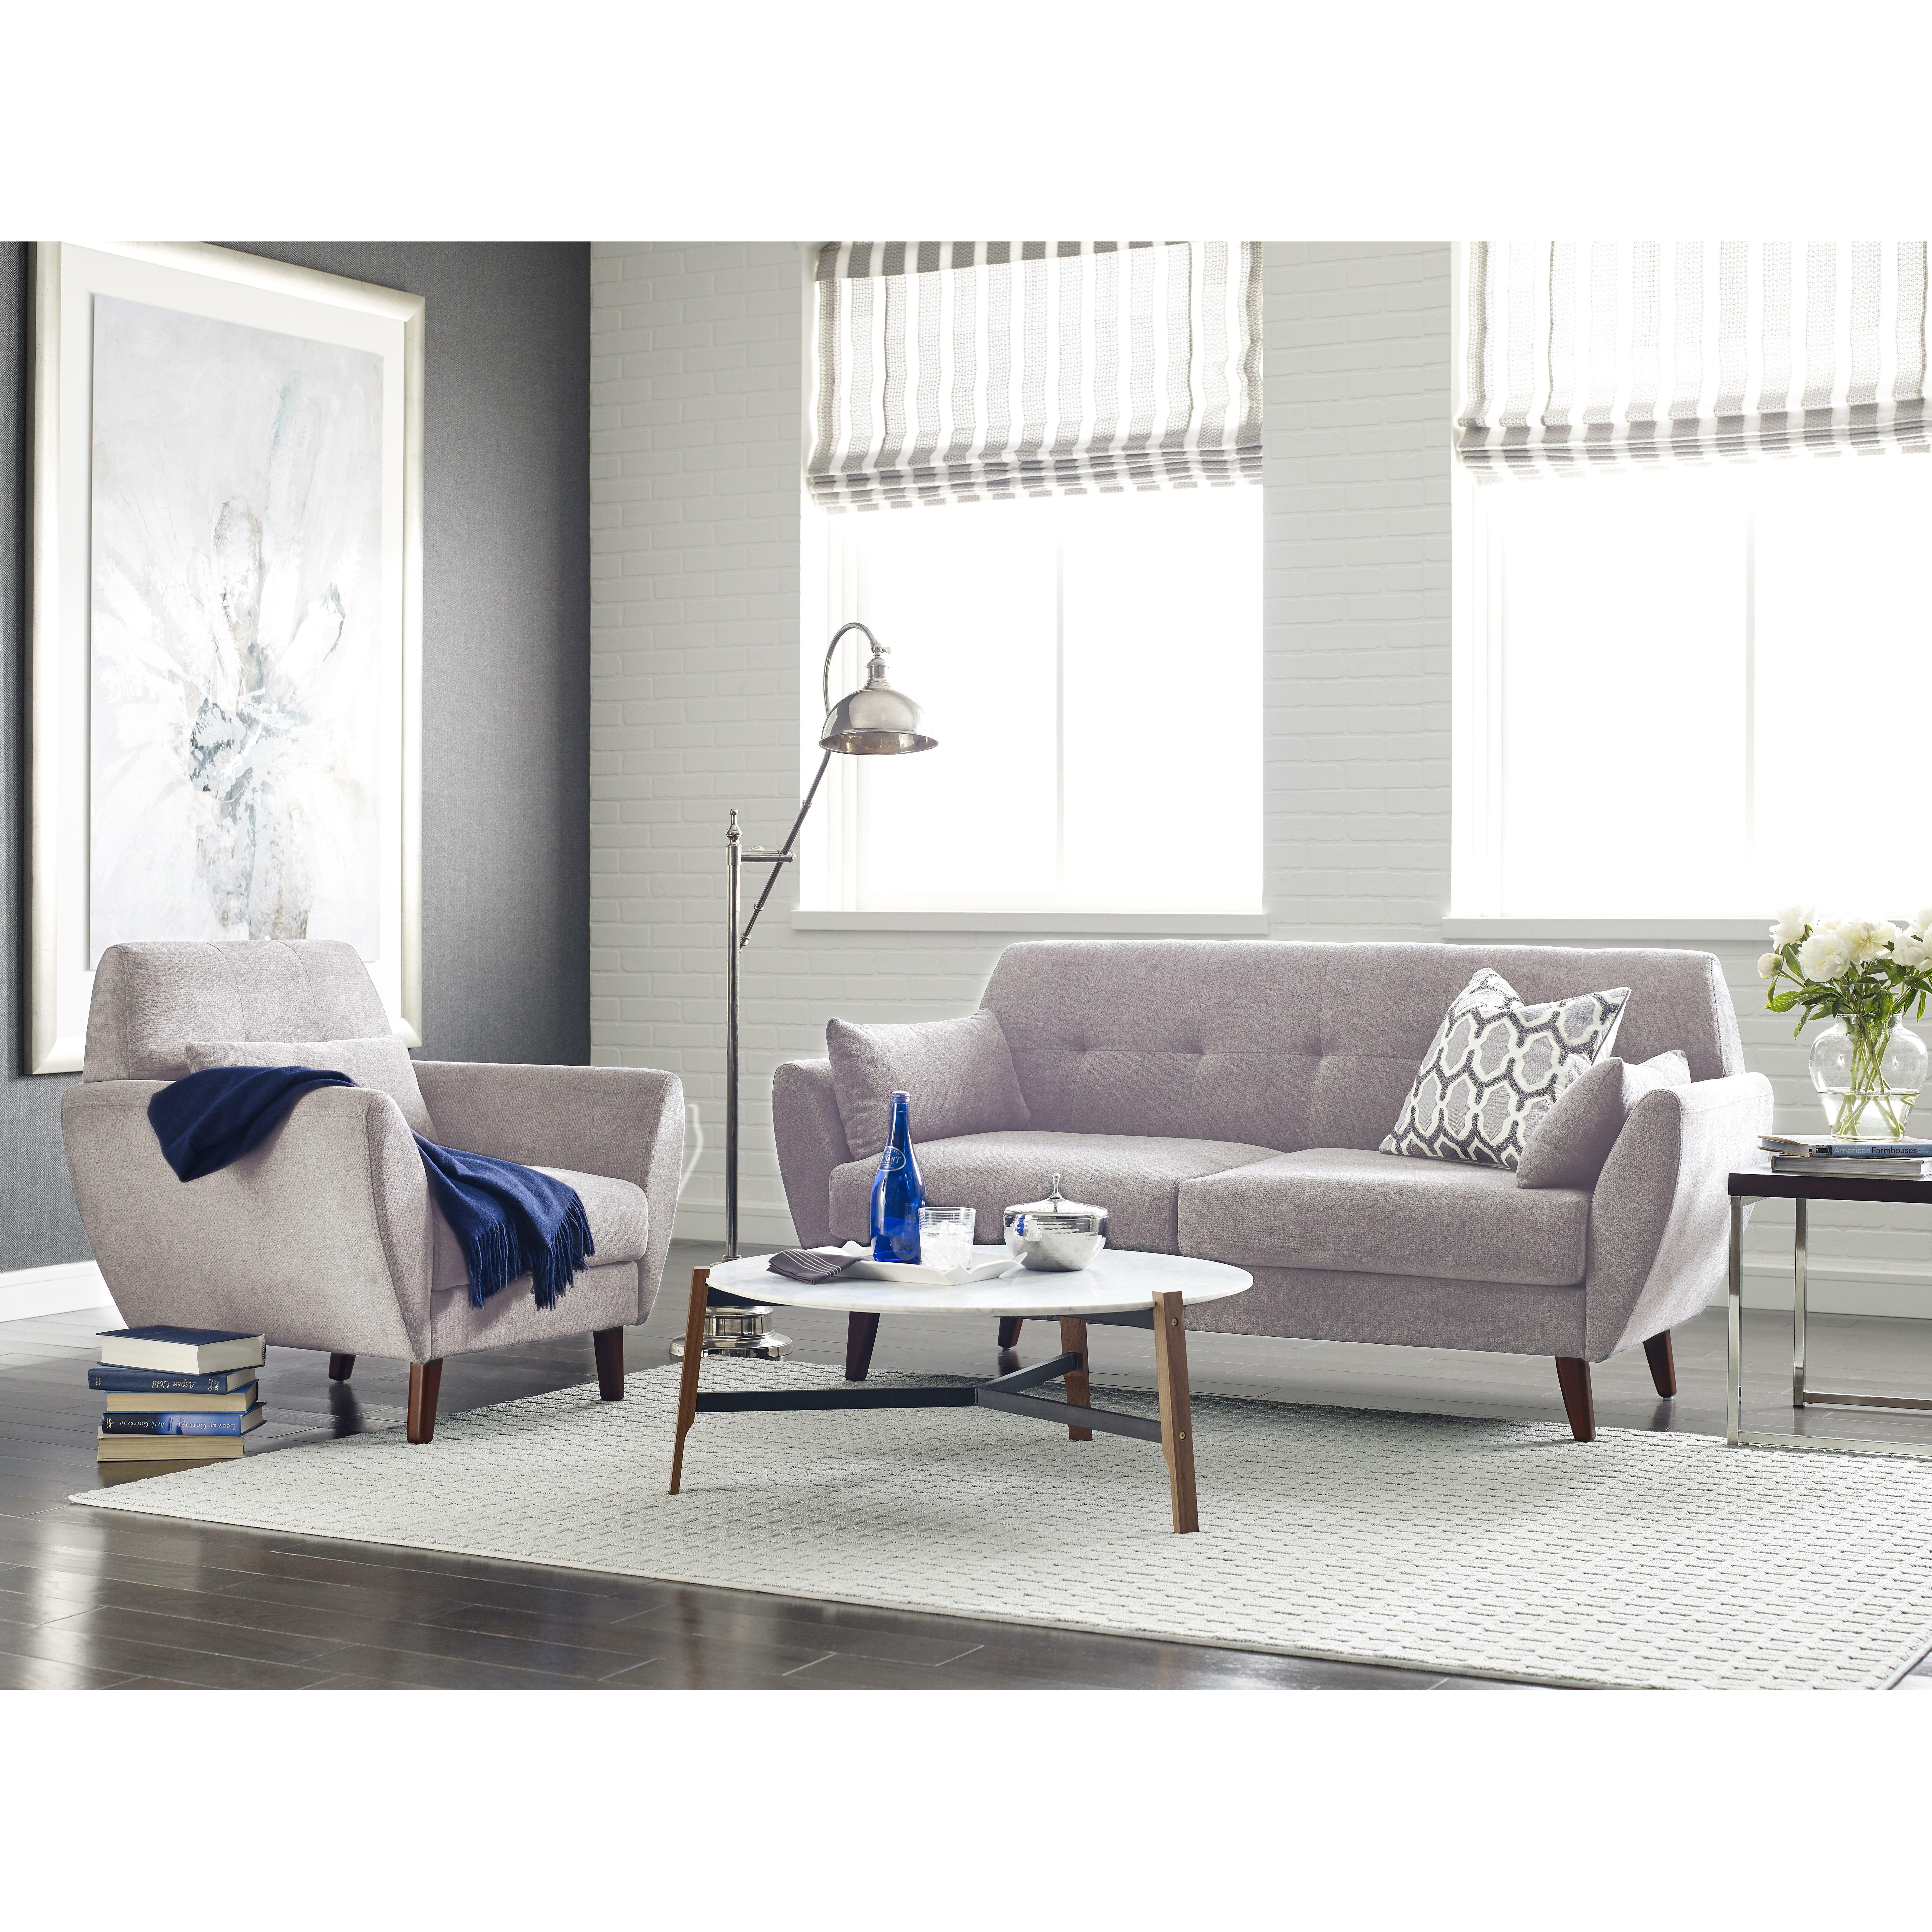 Serta at home artesia living room collection